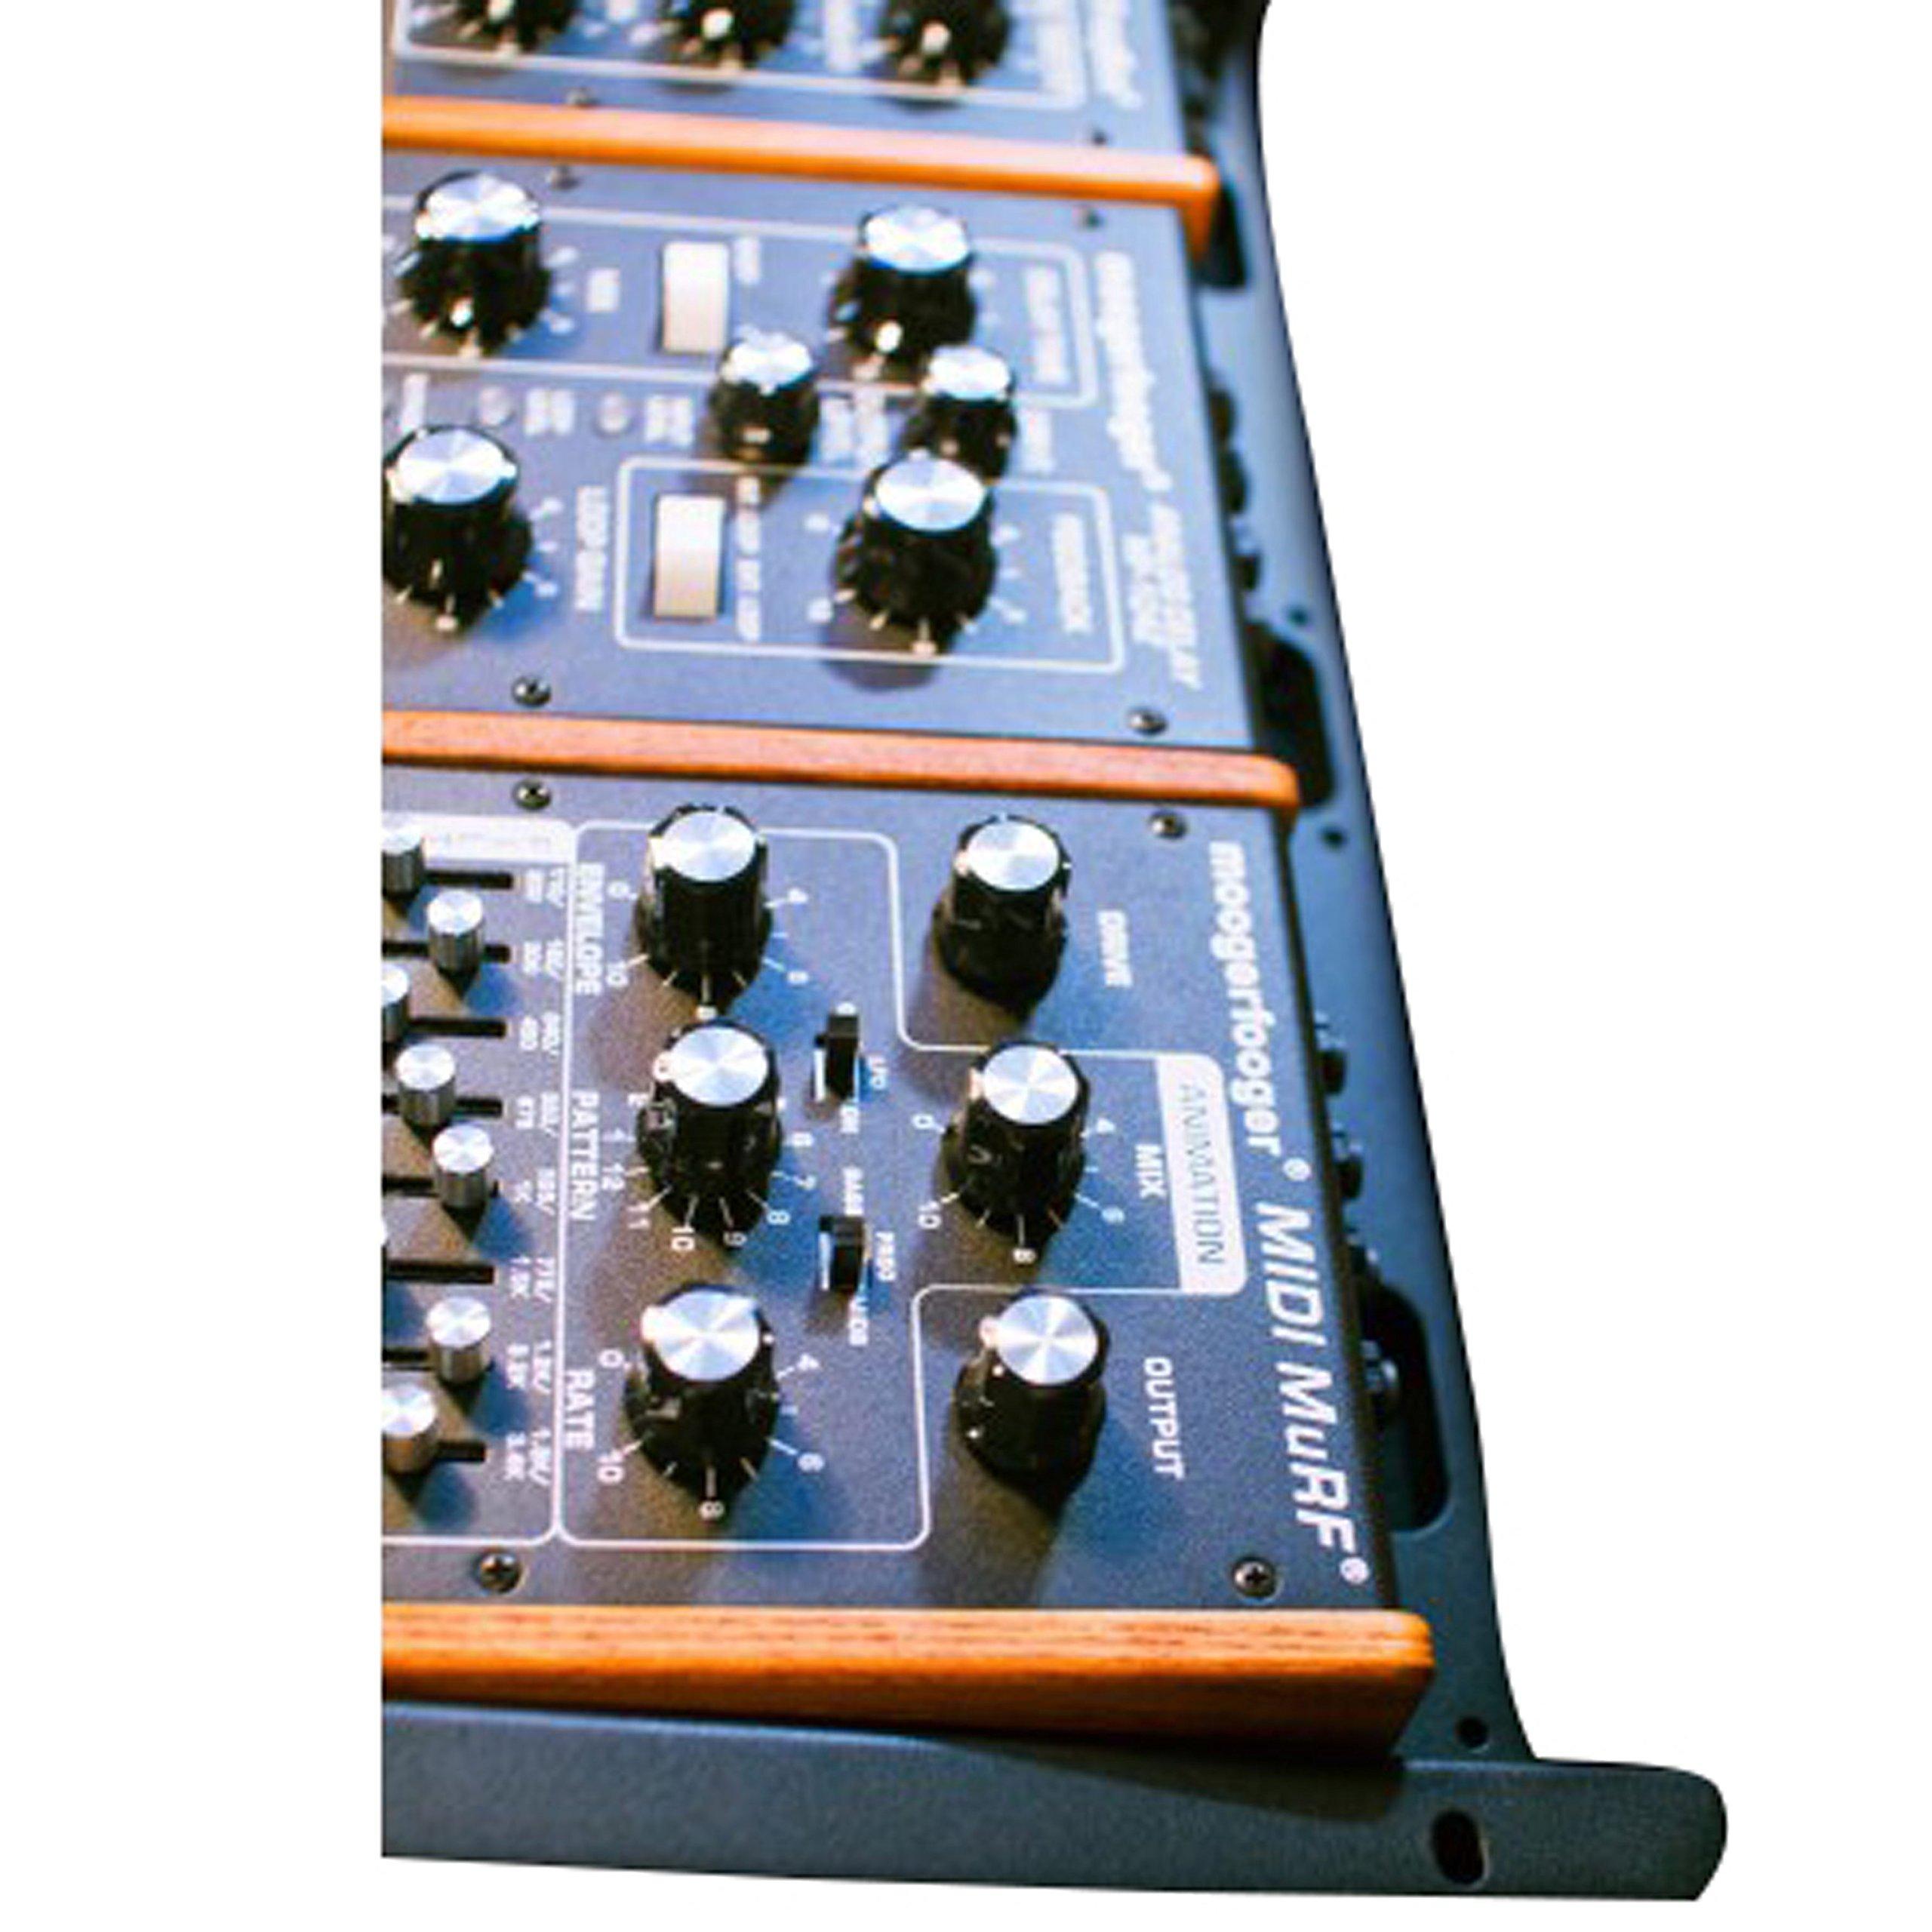 Moog Moogerfooger Rack Mount Kit by Moog Music Inc.